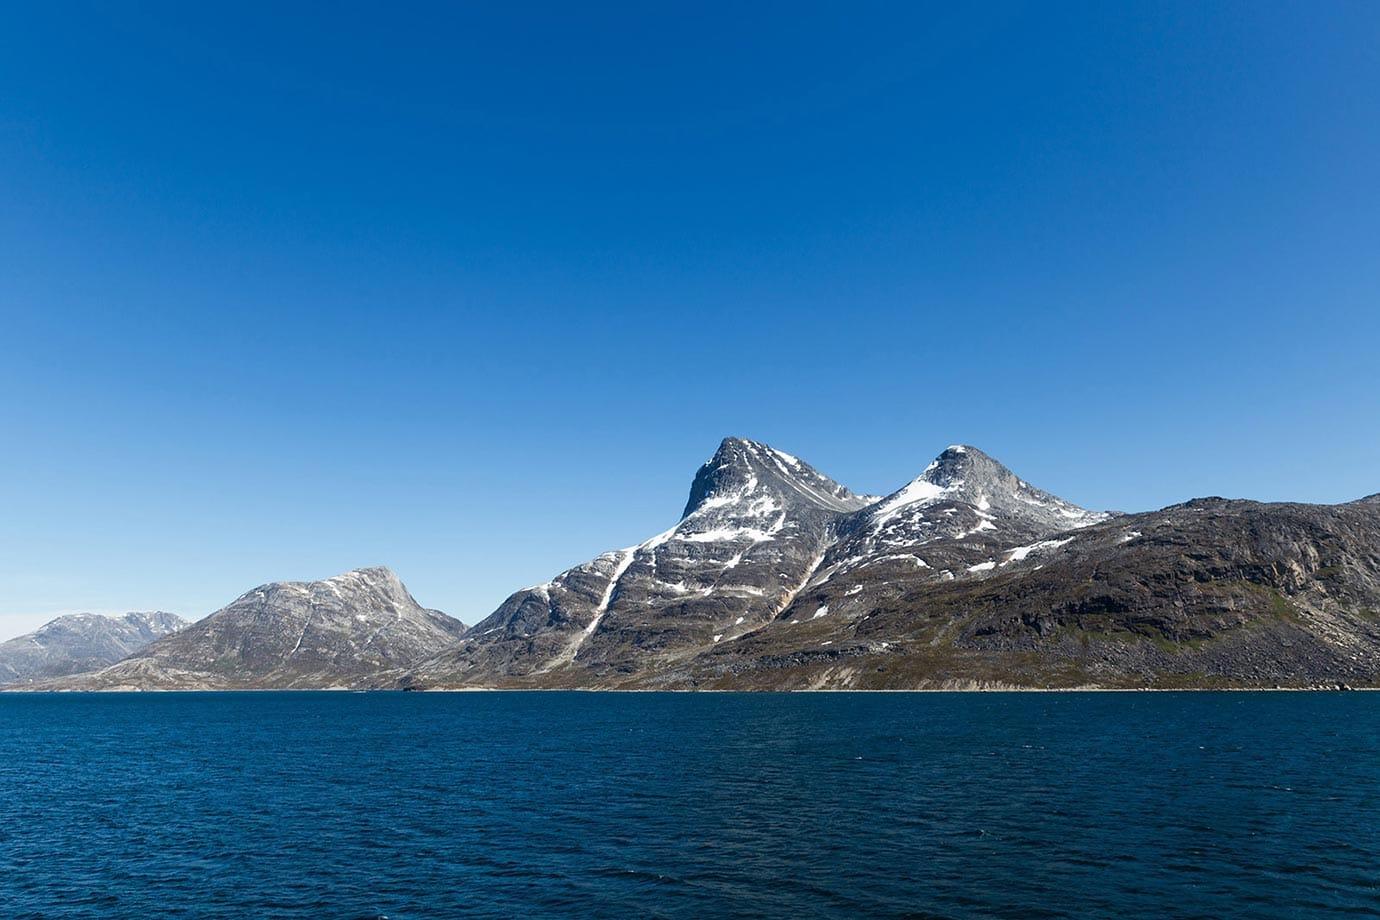 Greenland's coast